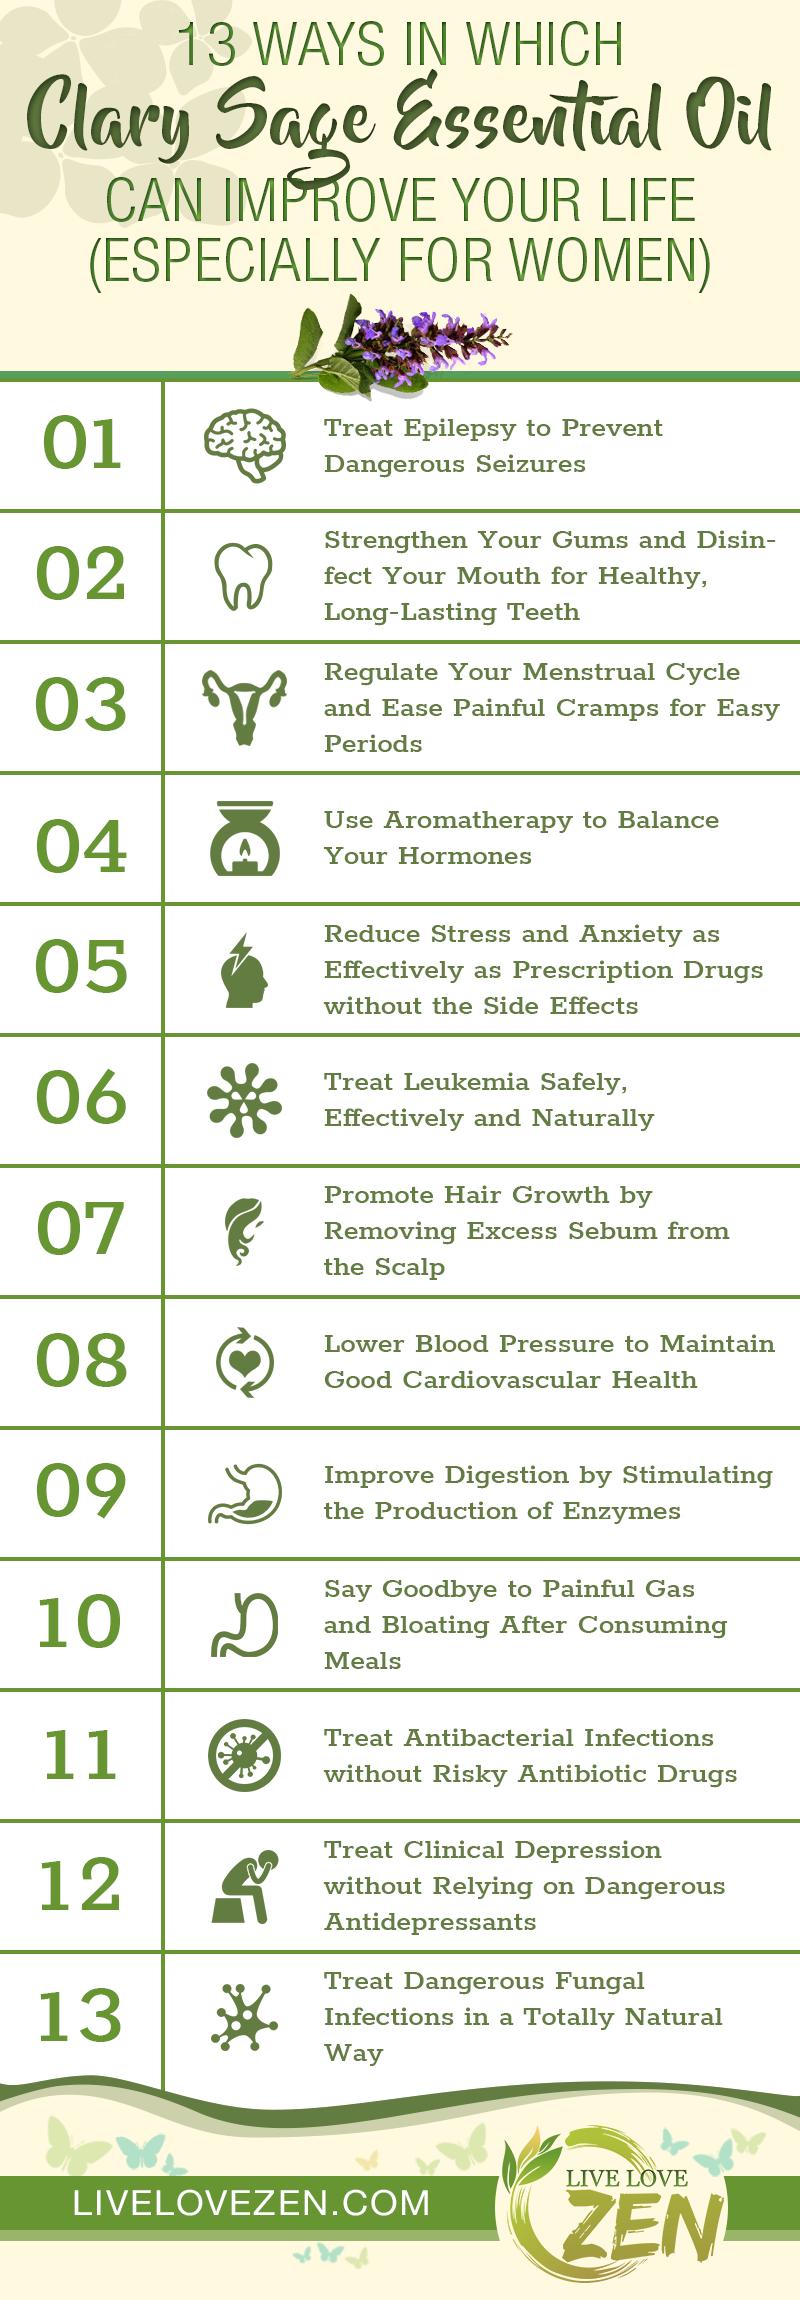 clarysage essential oil health benefits